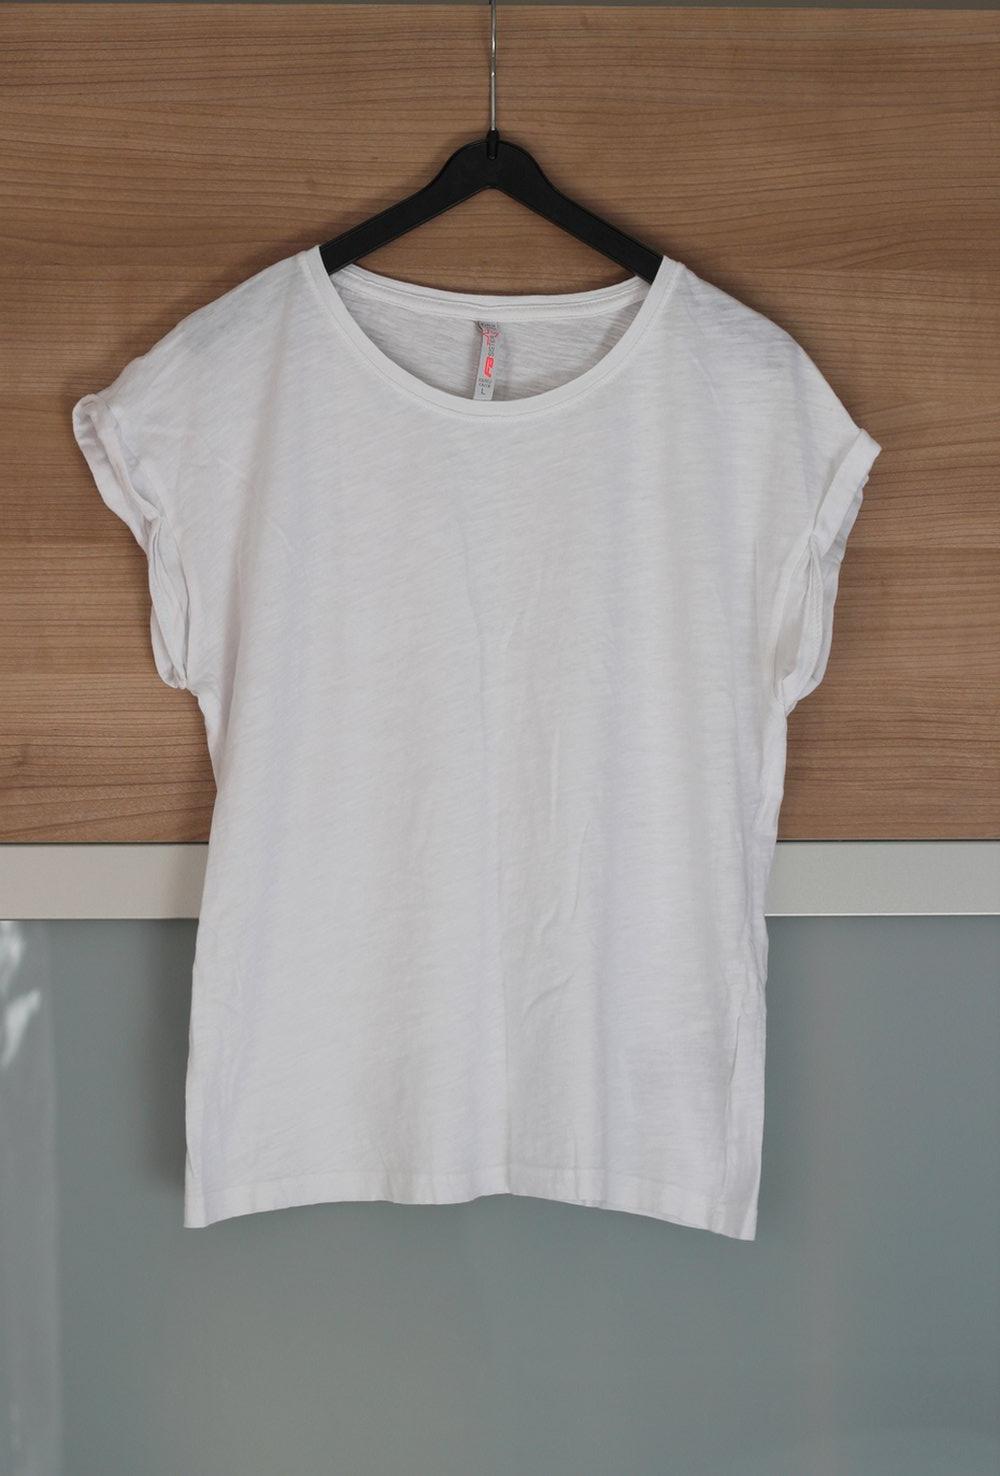 wei es fishbone basic shirt mit umgekrempelten rmeln. Black Bedroom Furniture Sets. Home Design Ideas